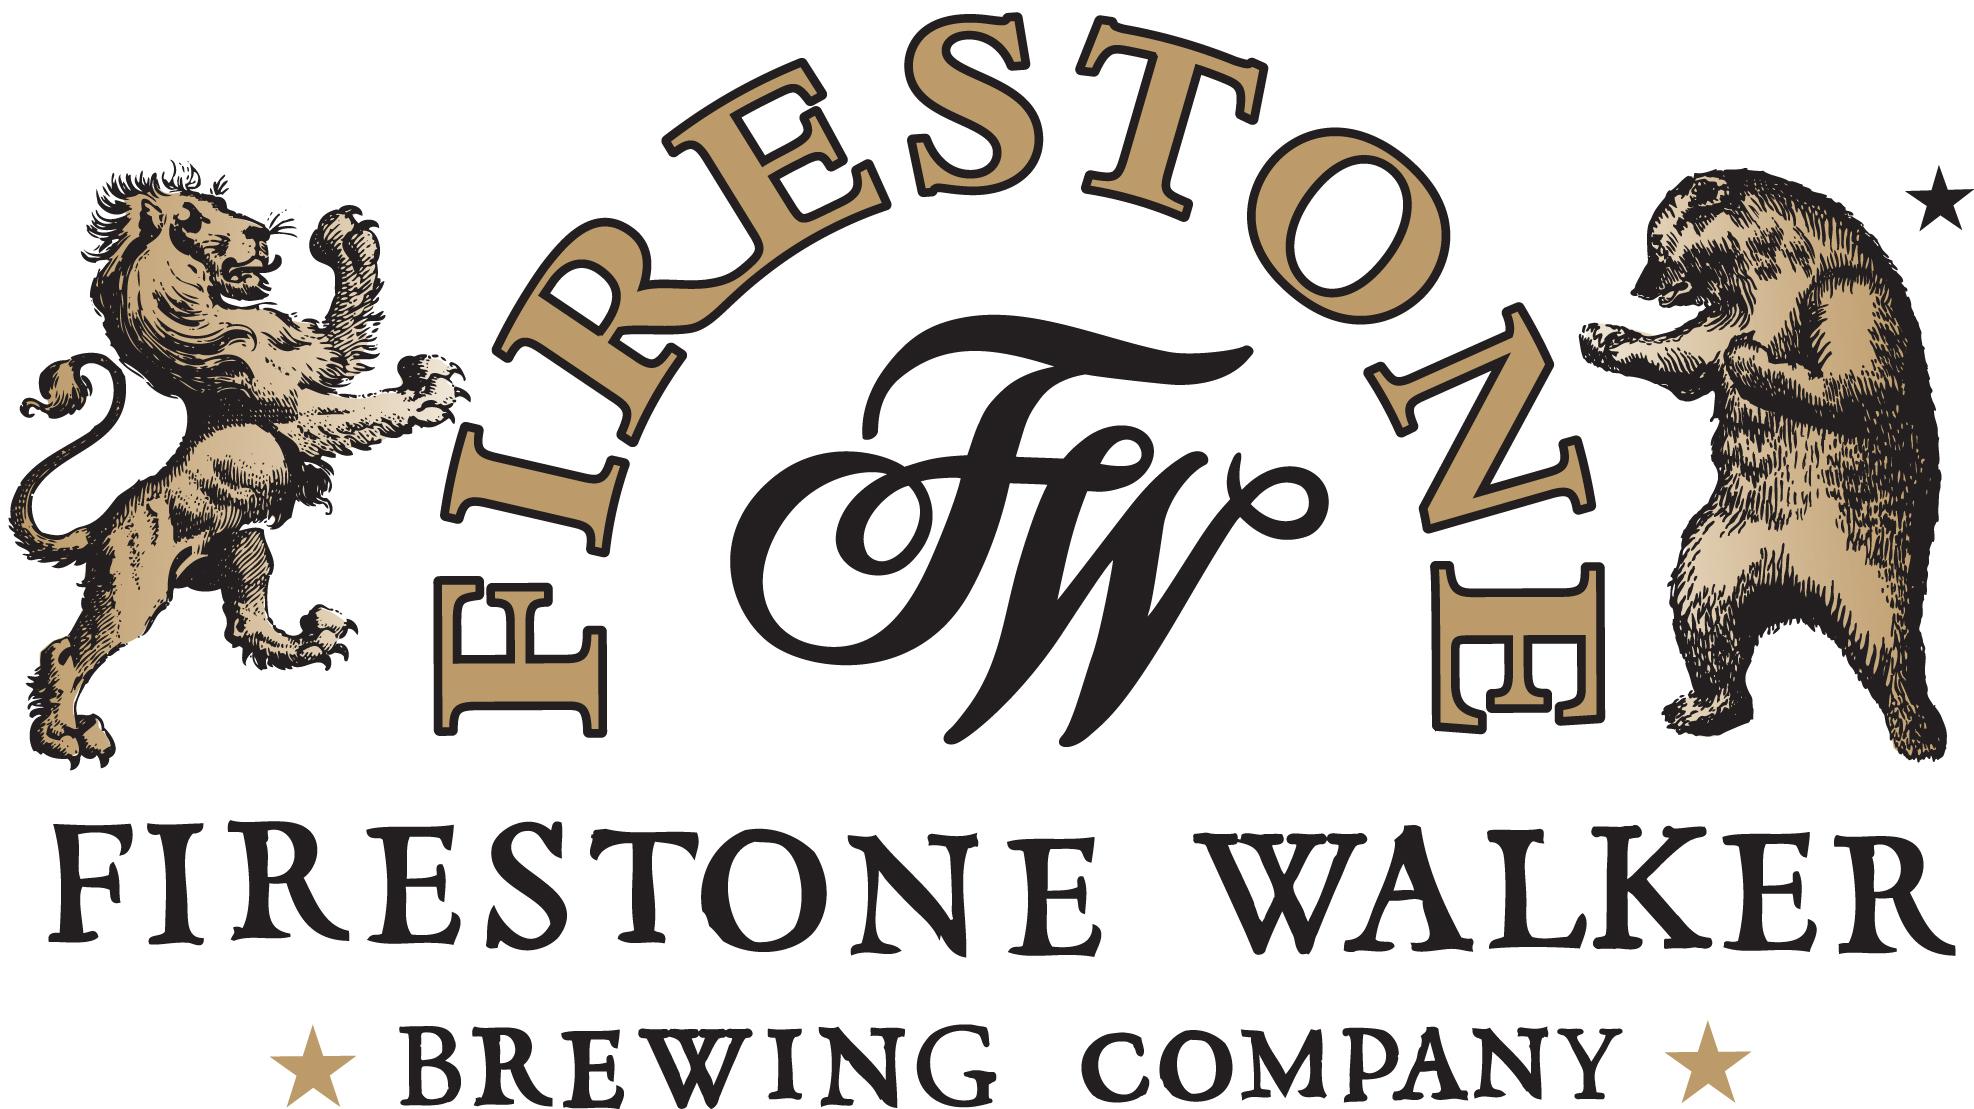 Firestone Walker iscoming!